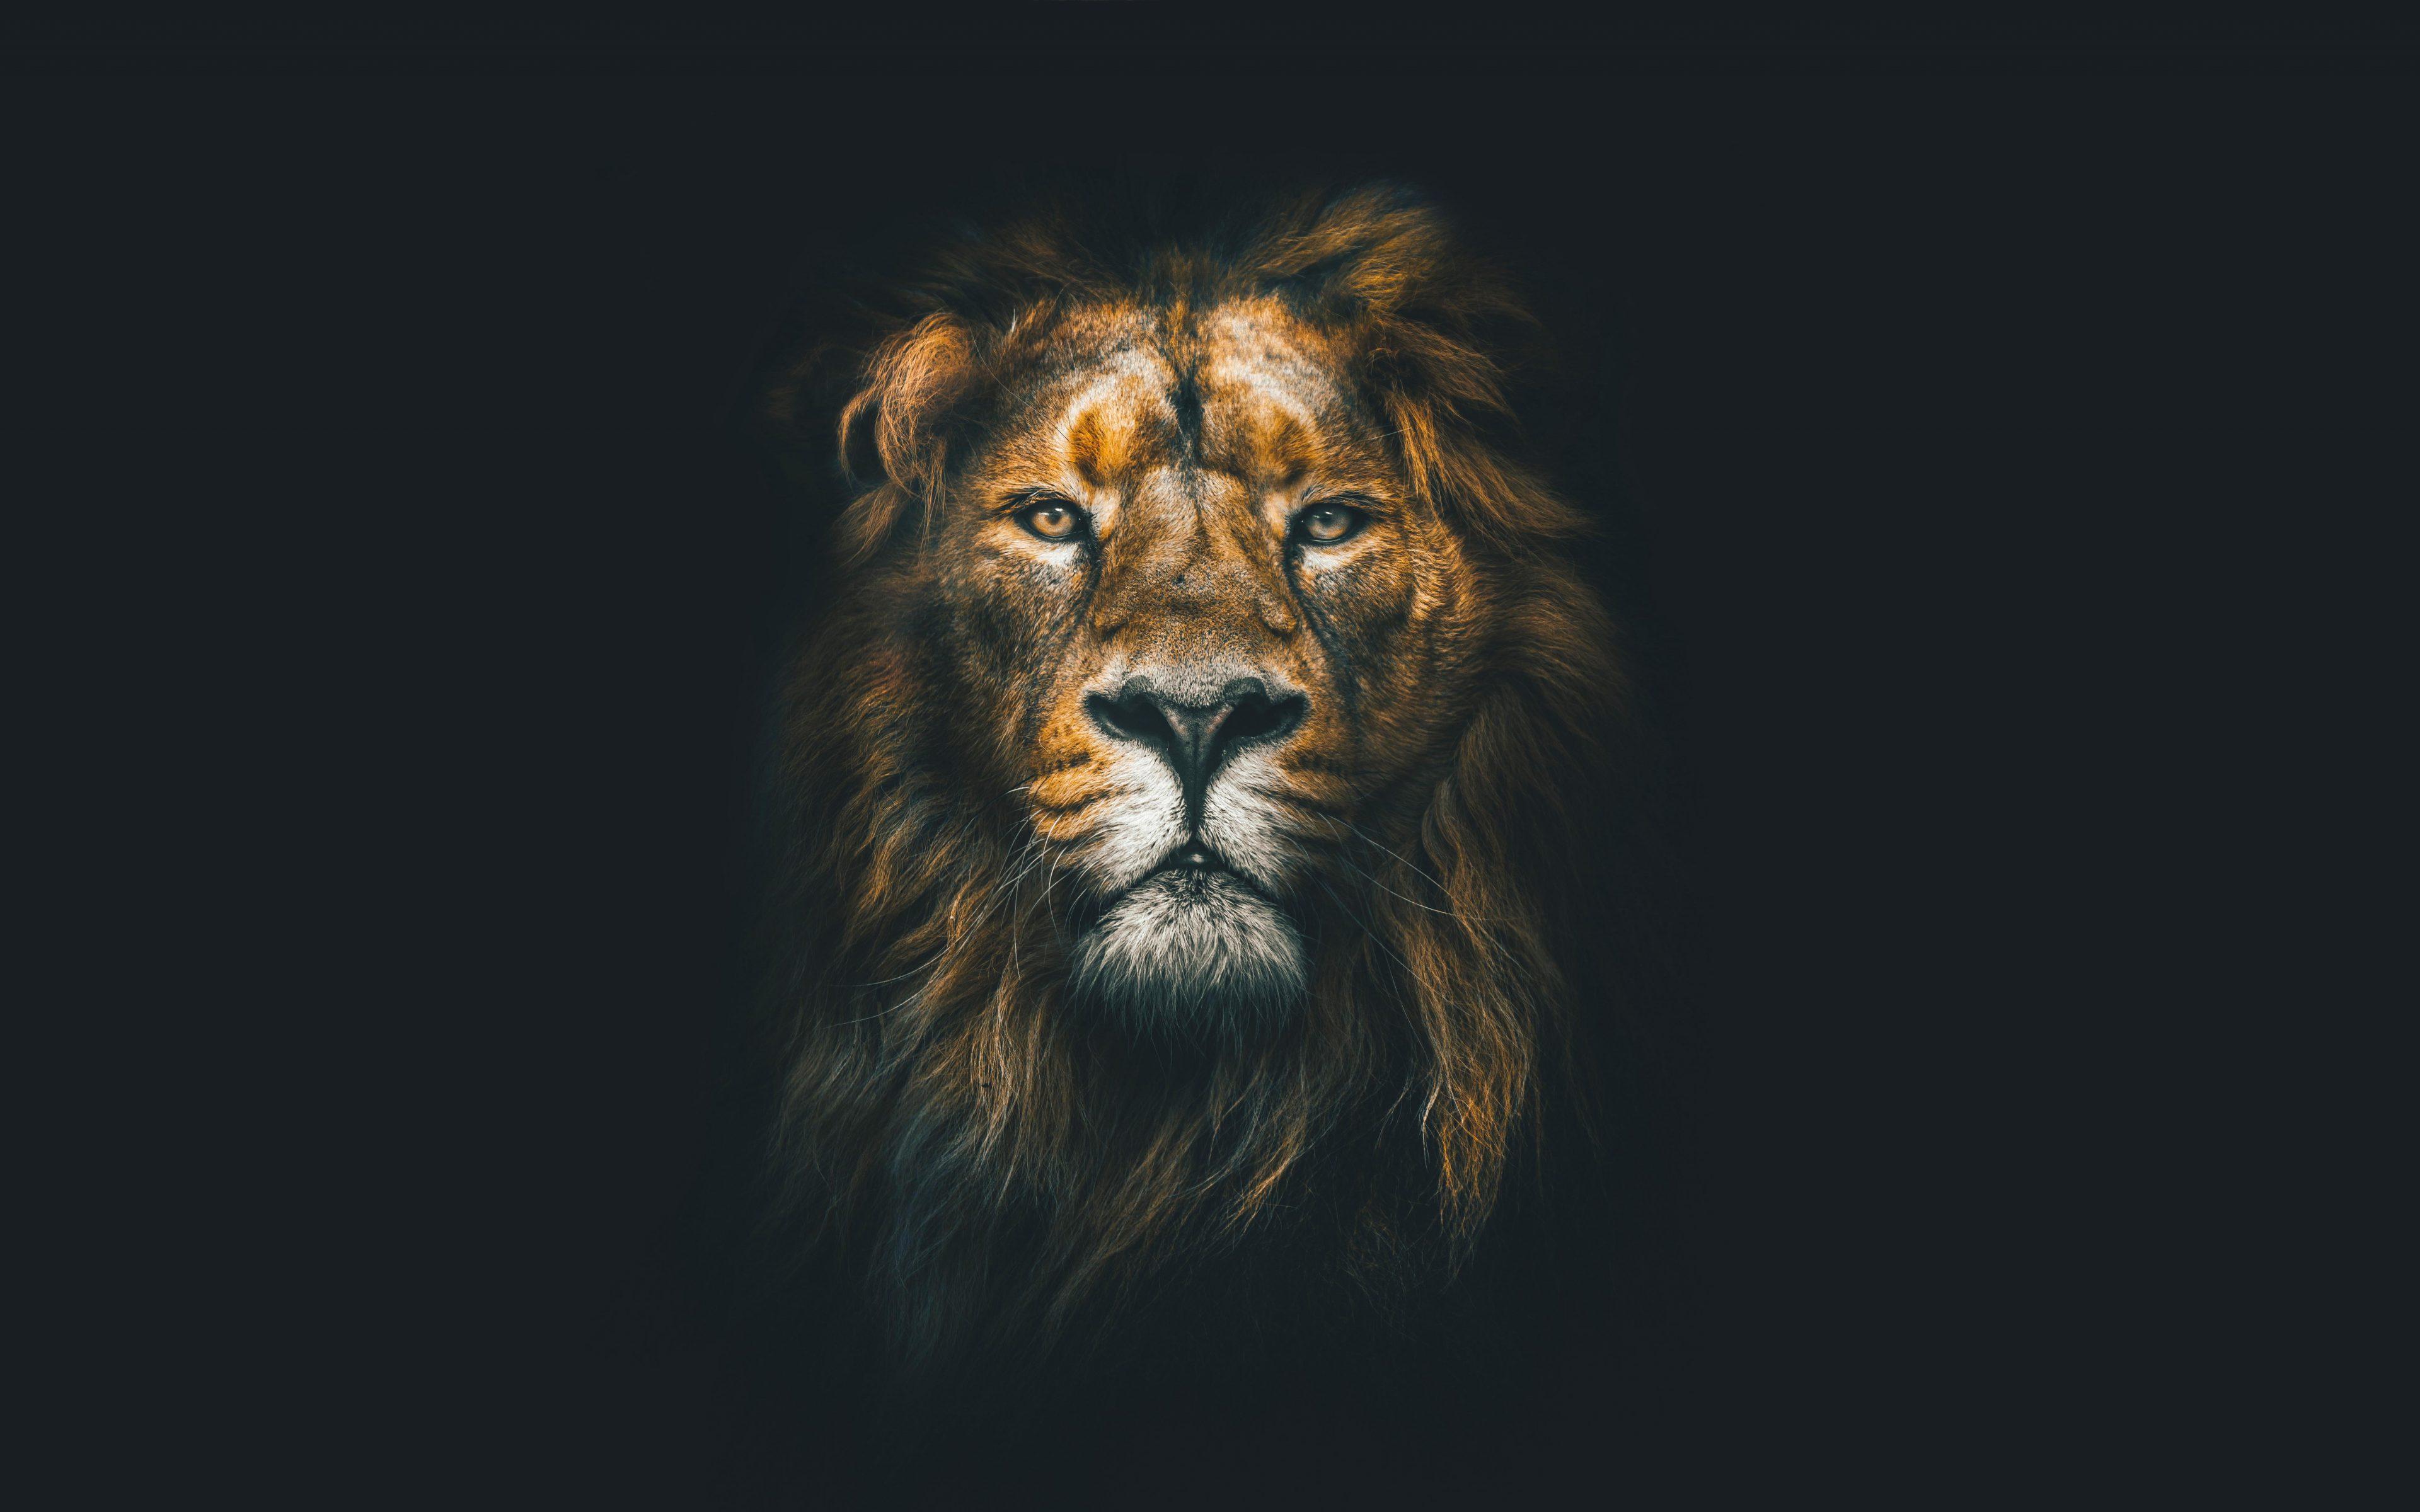 Lion face closeup wild animal wildlife 8k wallpaper best - 8k animal wallpaper ...